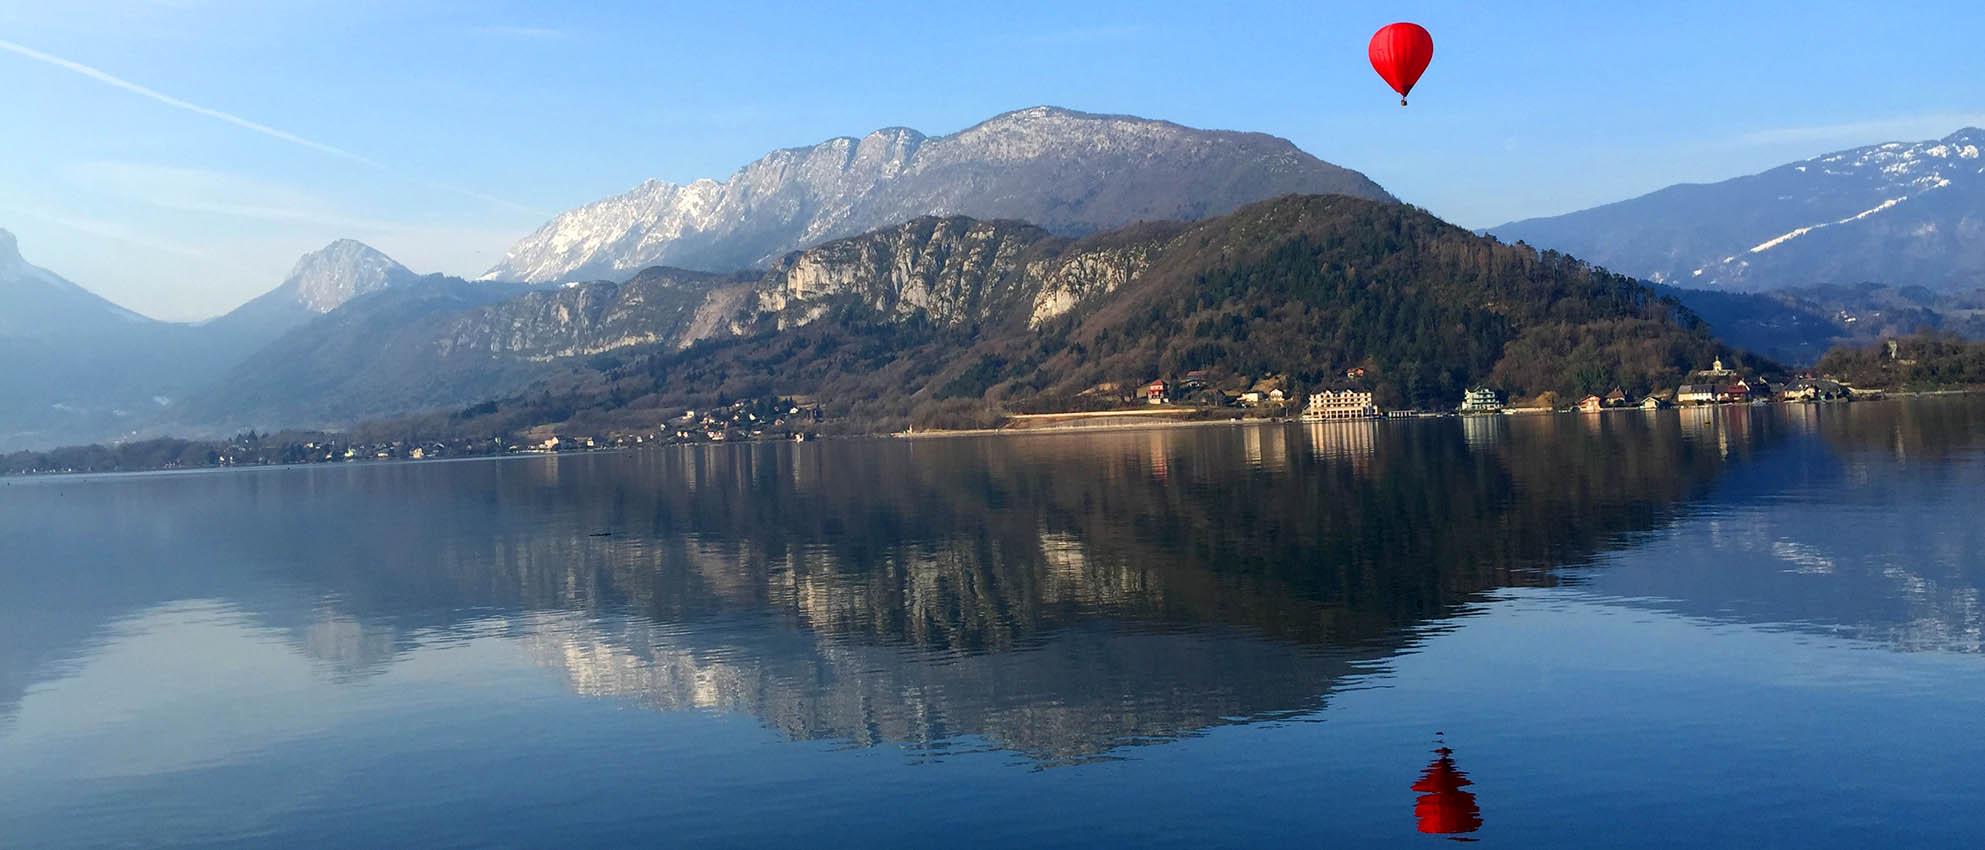 montgolfiere lac annecy haute savoie